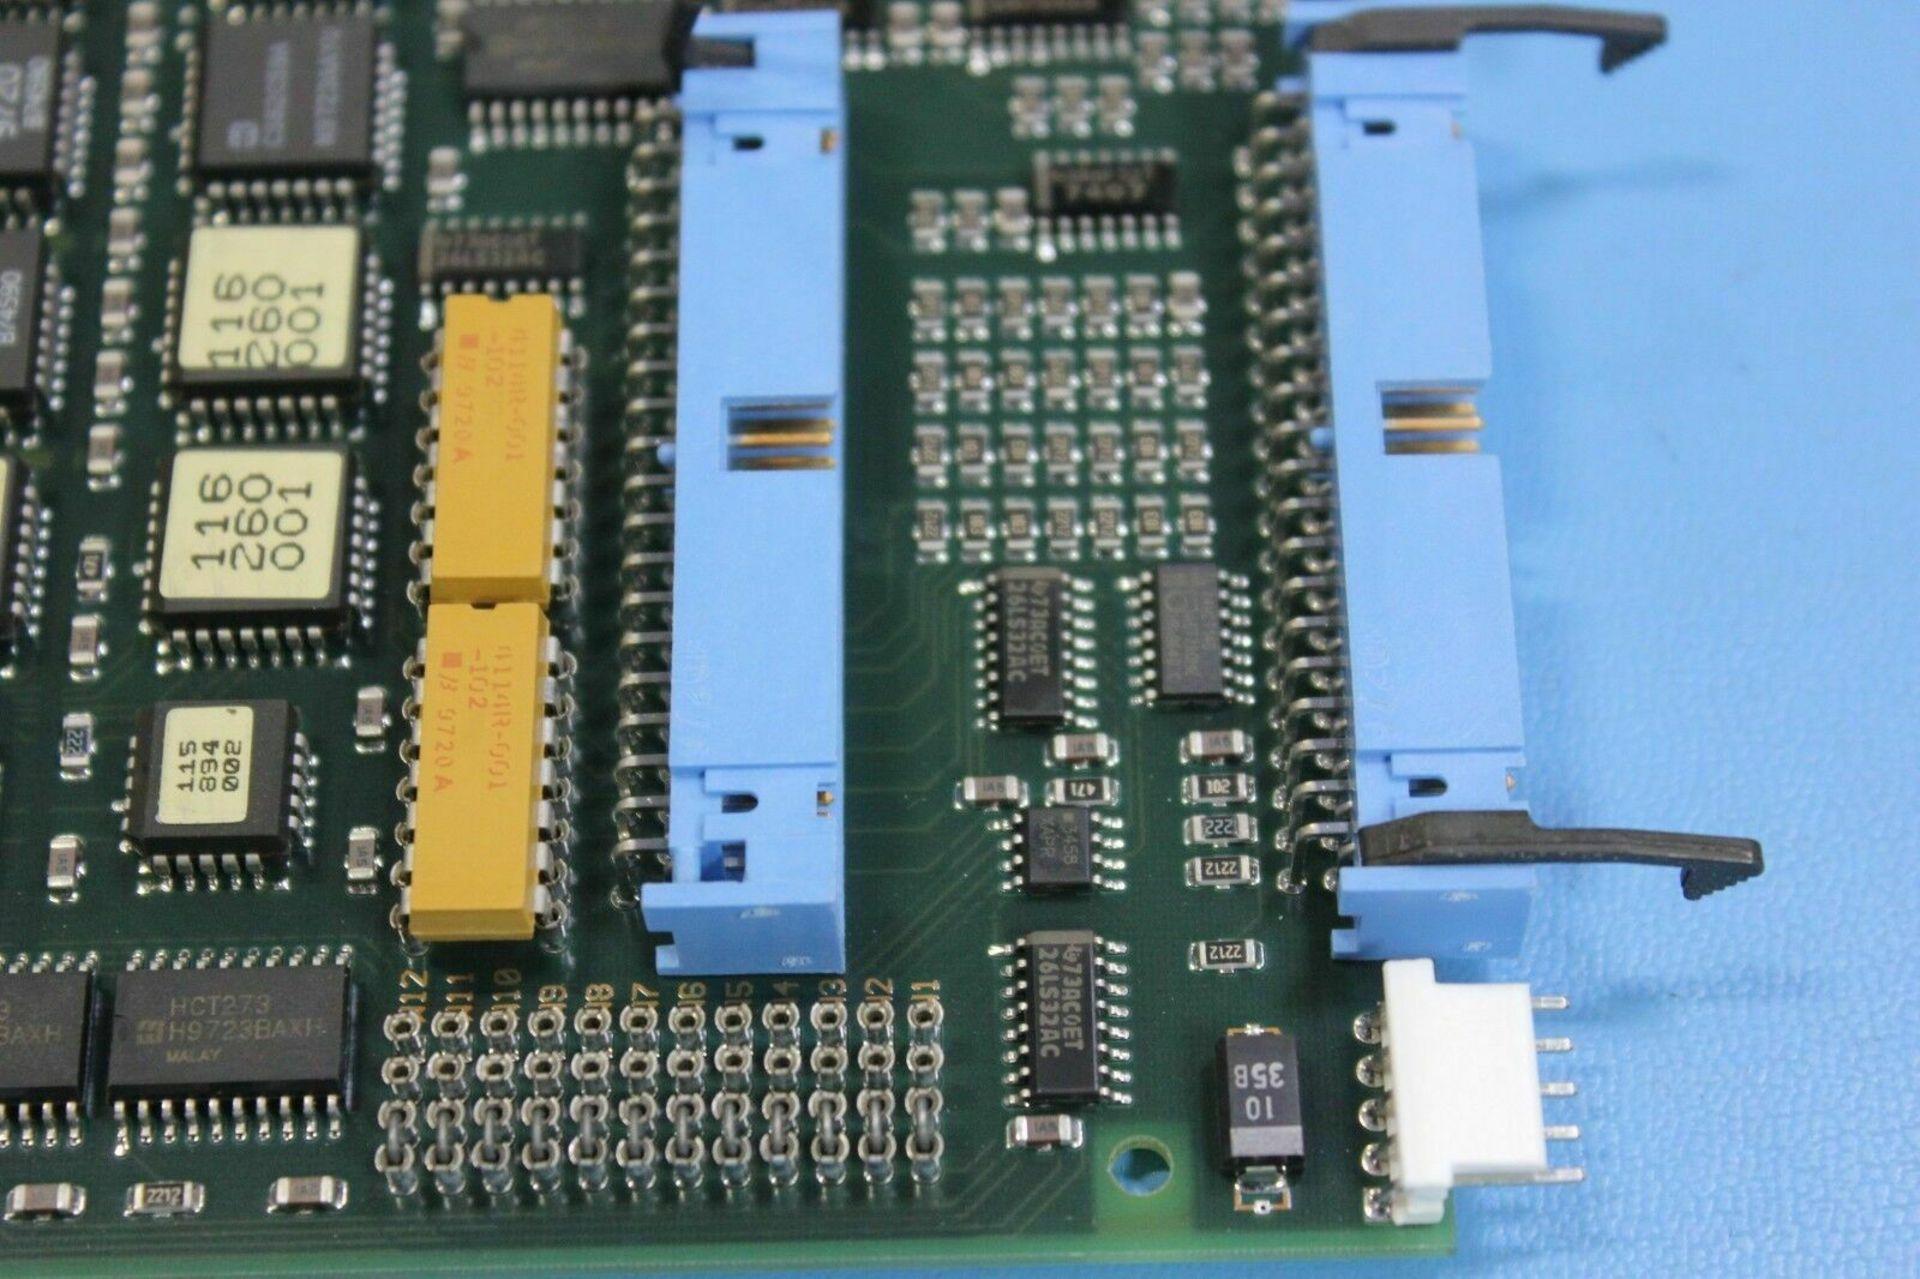 UNUSED PROLOG STD BUS SERVO CONTROLLER PC BOARD - Image 5 of 5